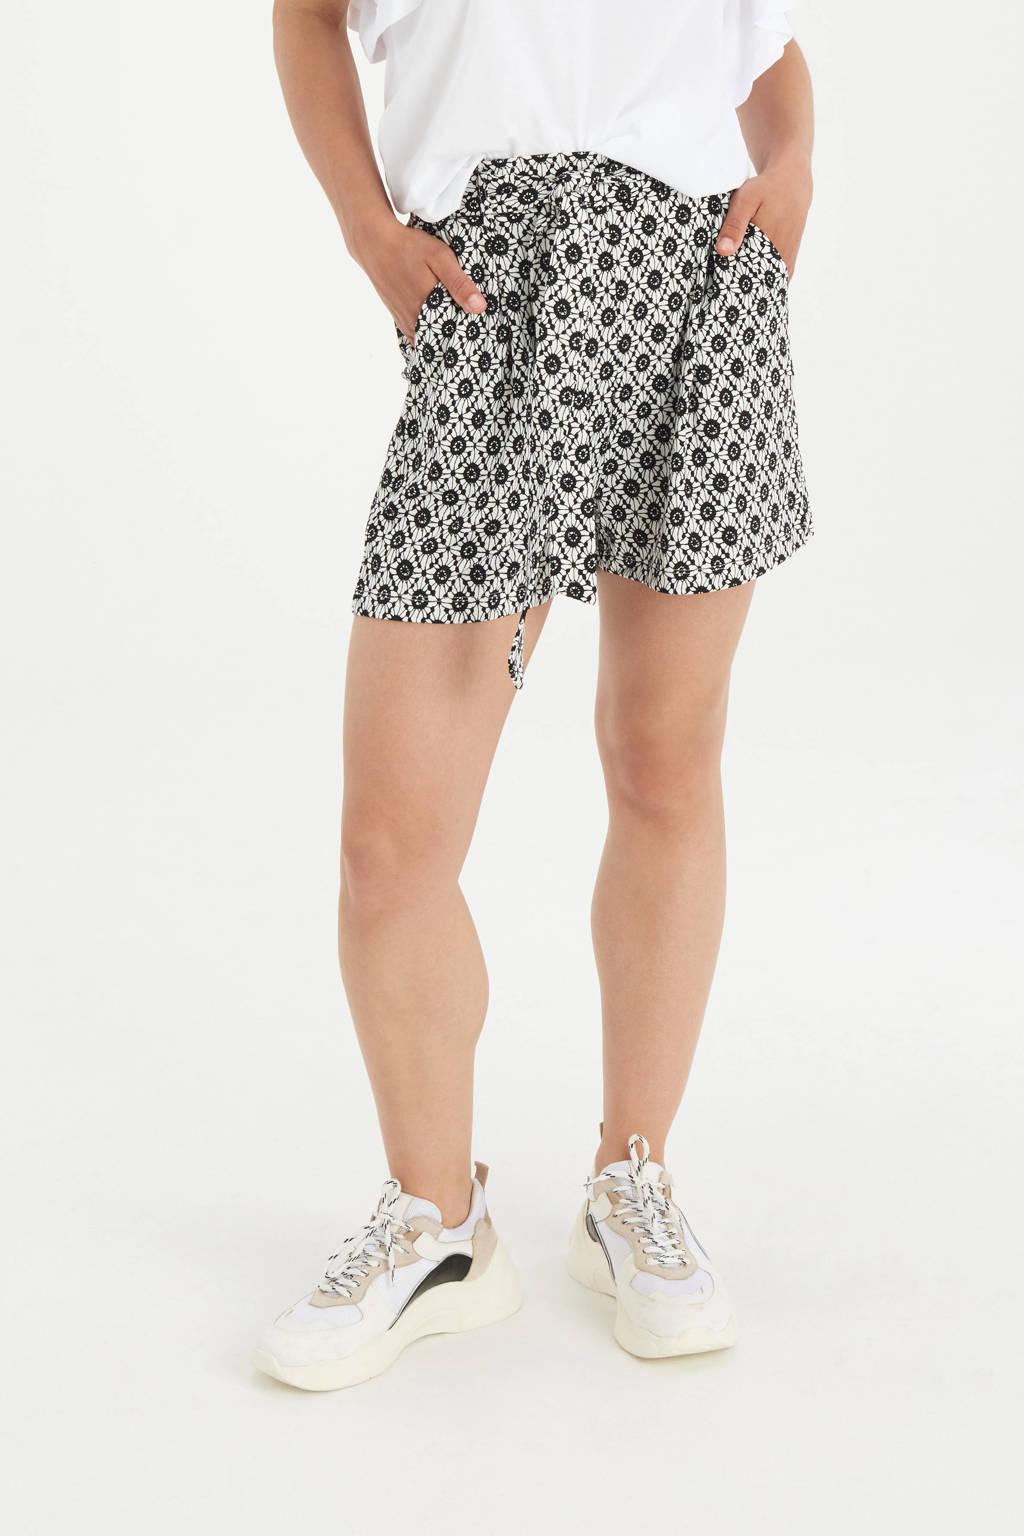 Shoeby Eksept straight fit korte broek Lise met all over print zwart/wit, Zwart/wit